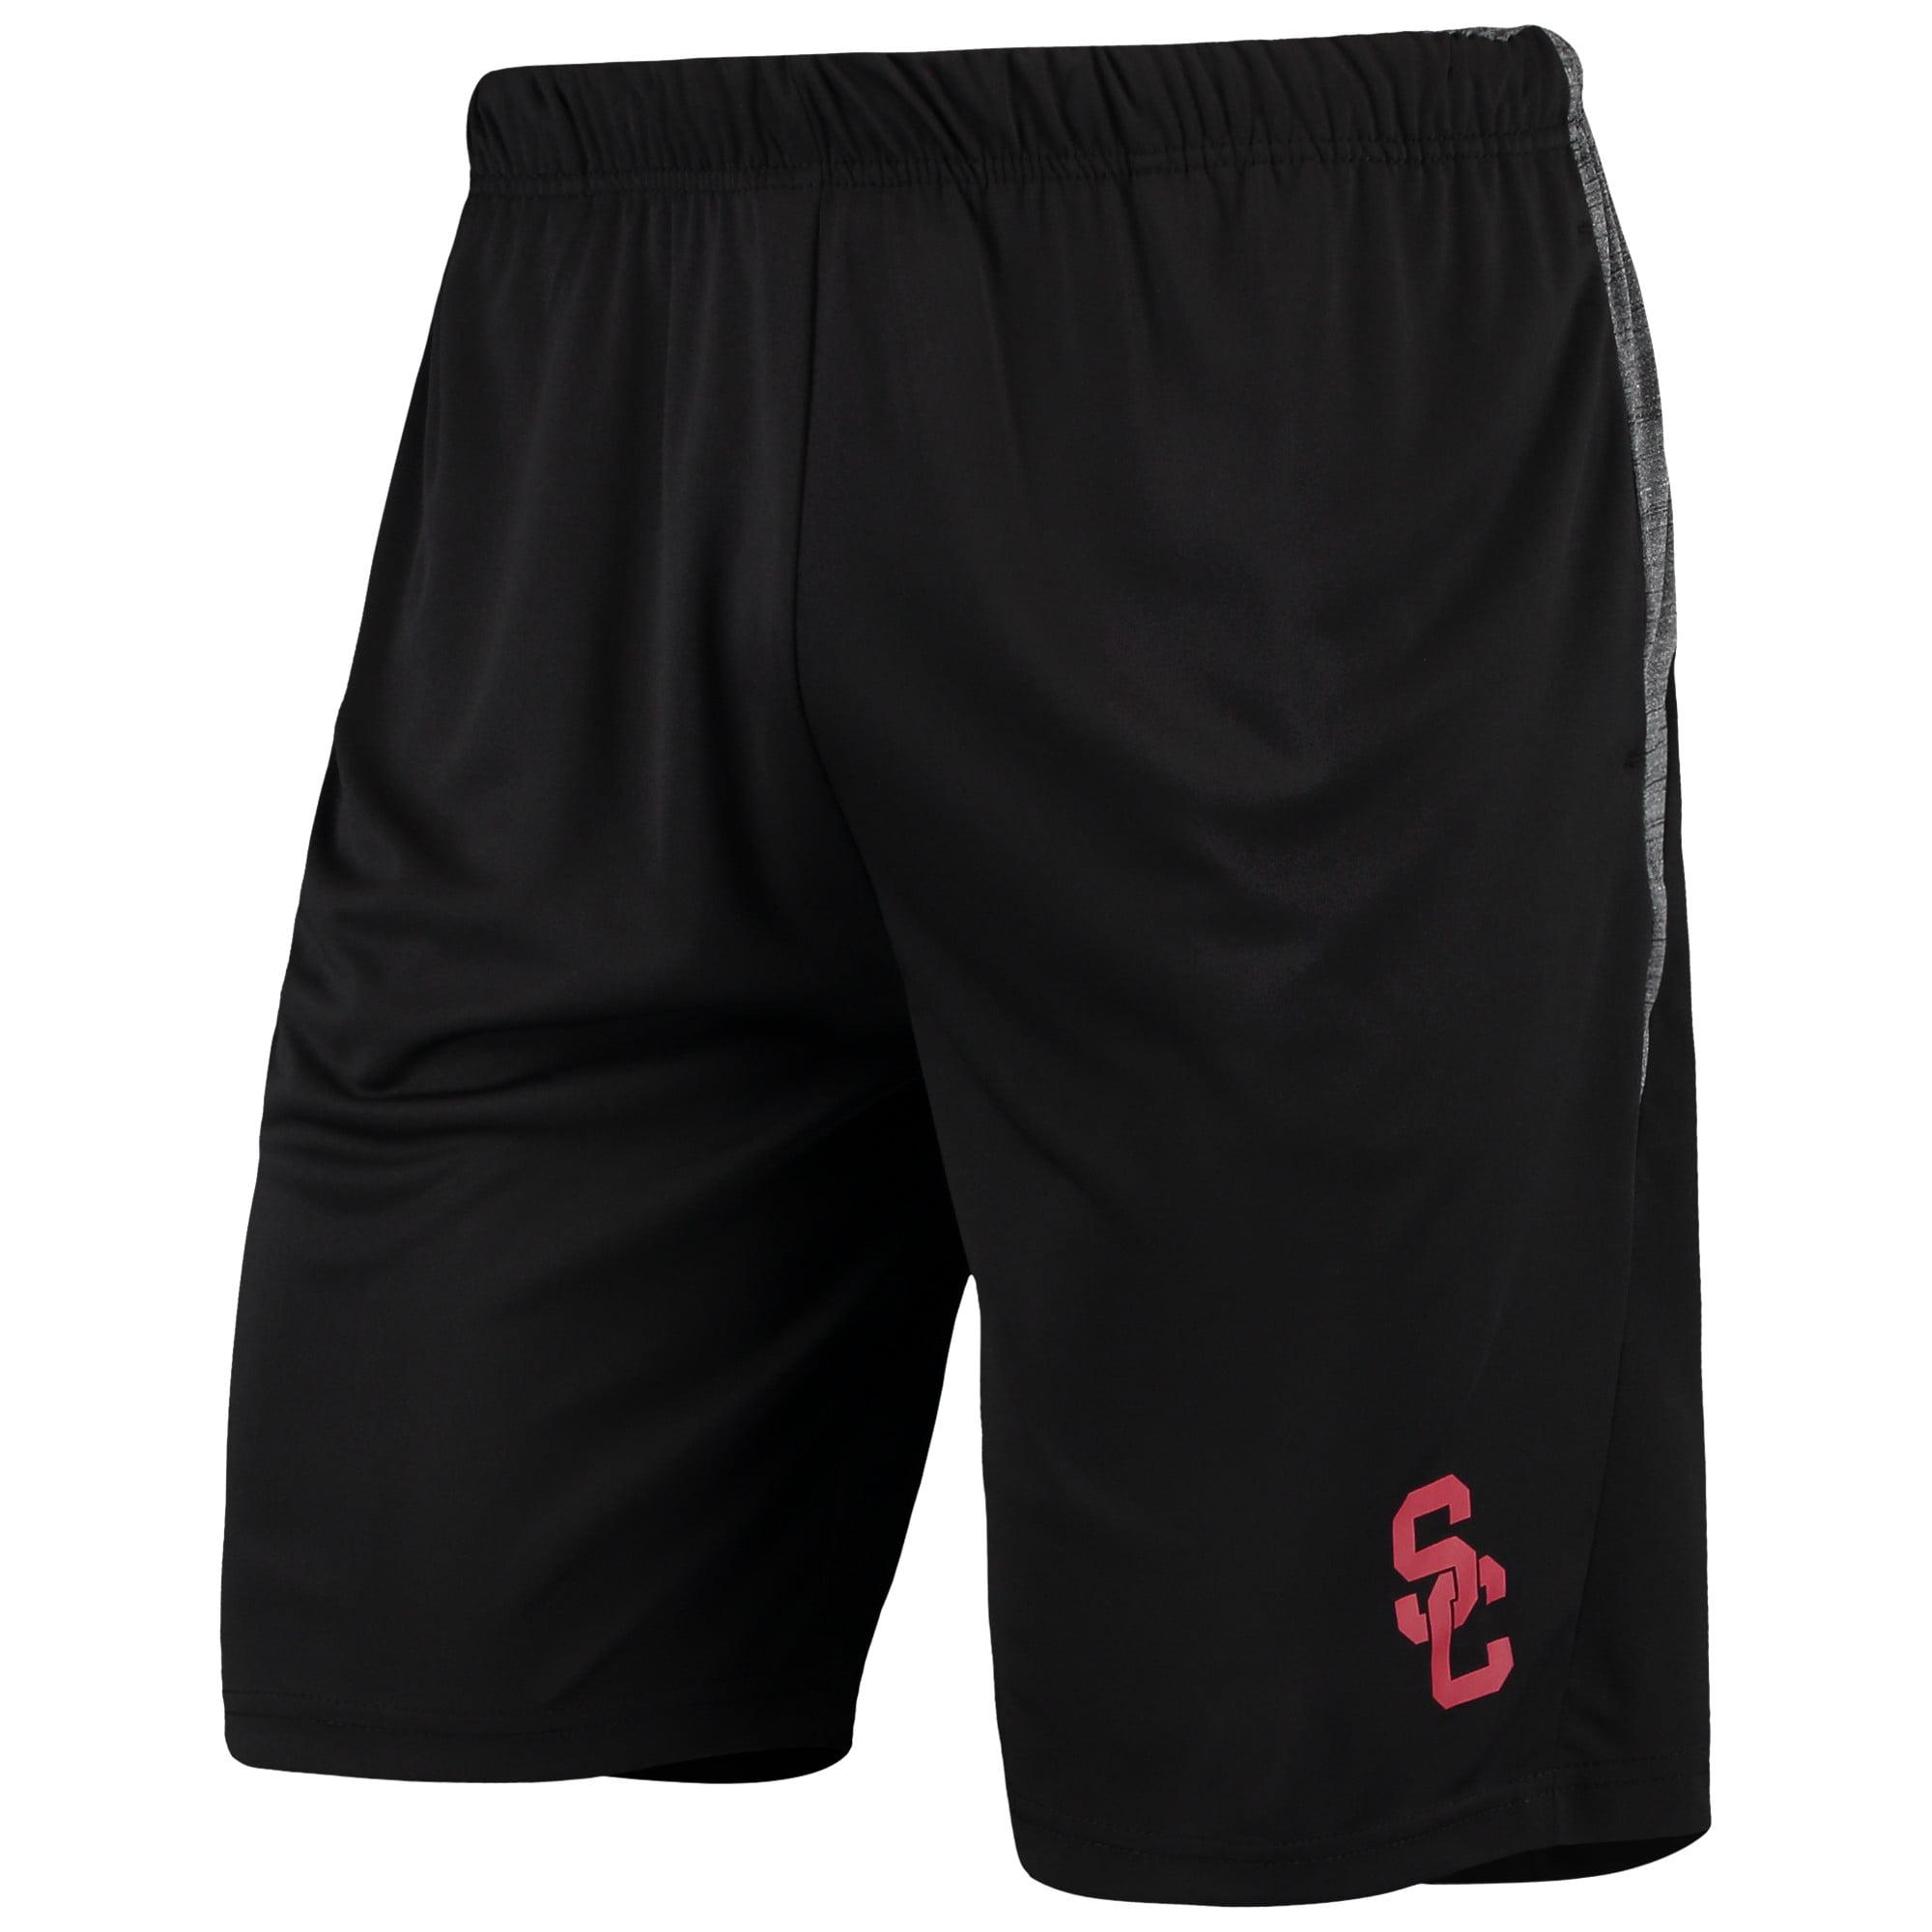 Men's Black/Charcoal USC Trojans Draco Shorts